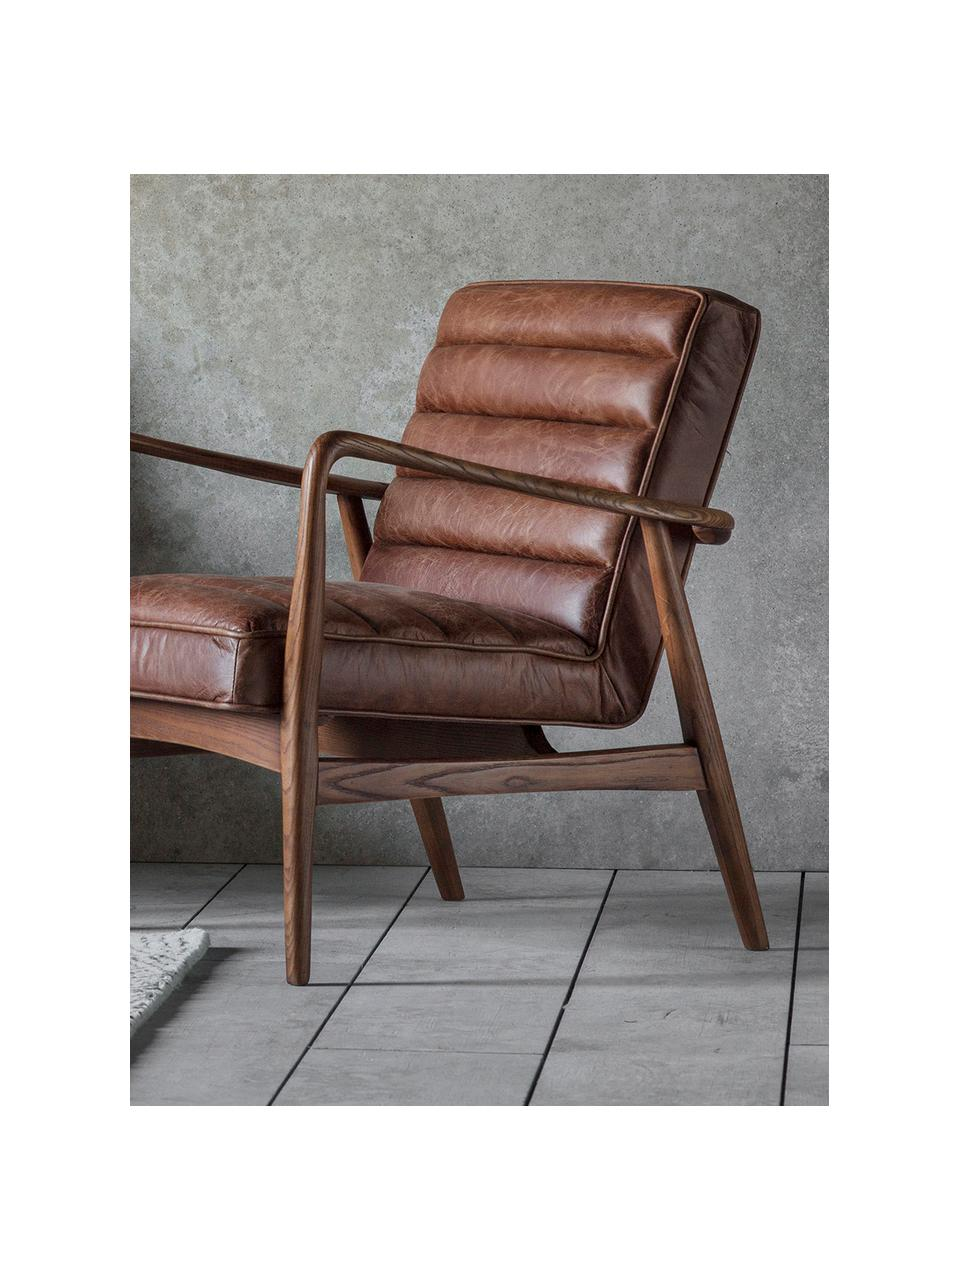 Leder-Loungesessel Datsun, Bezug: Genarbtes Leder, Gestell: Eschenholz, Leder Braun, B 70 x T 74 cm